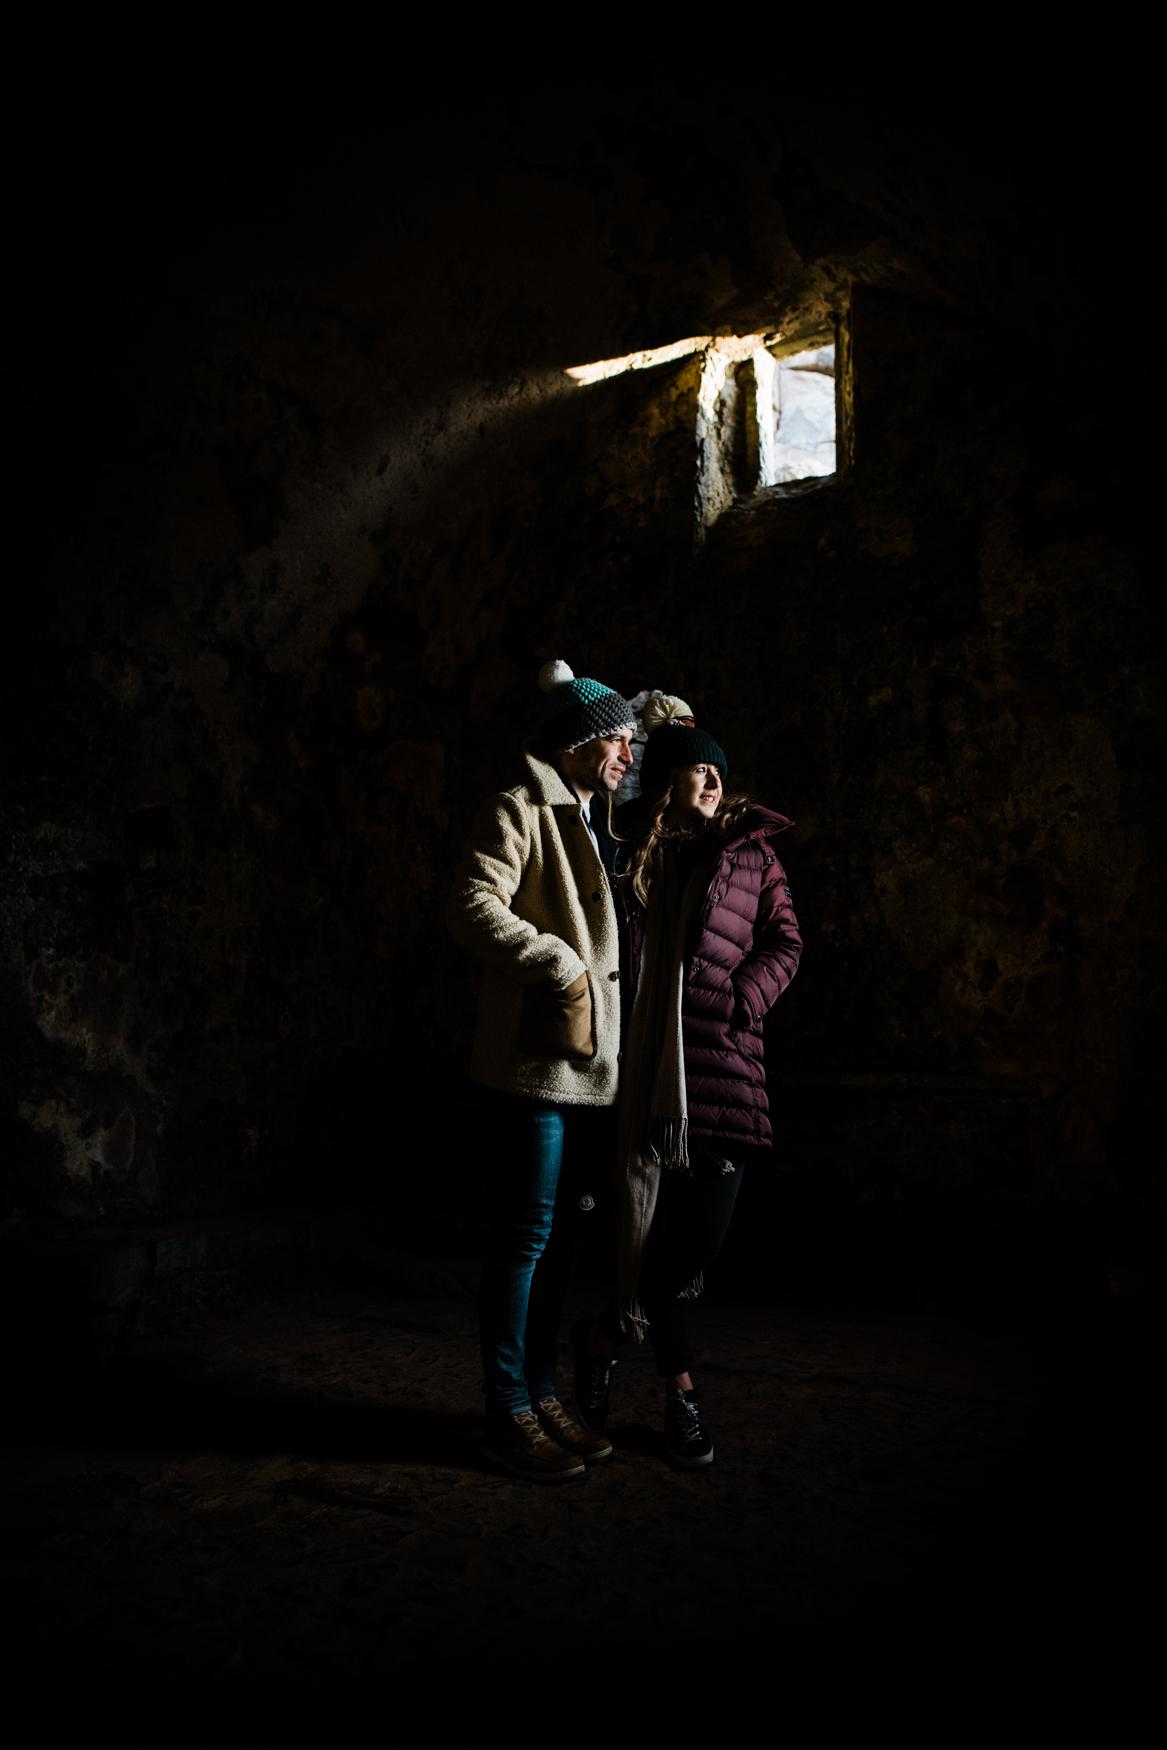 Alex-Sedgmond-Photography-Cardiff-Prewedding-Photography-Castlemartin-Pembrokeshire-WestWales-4.JPG